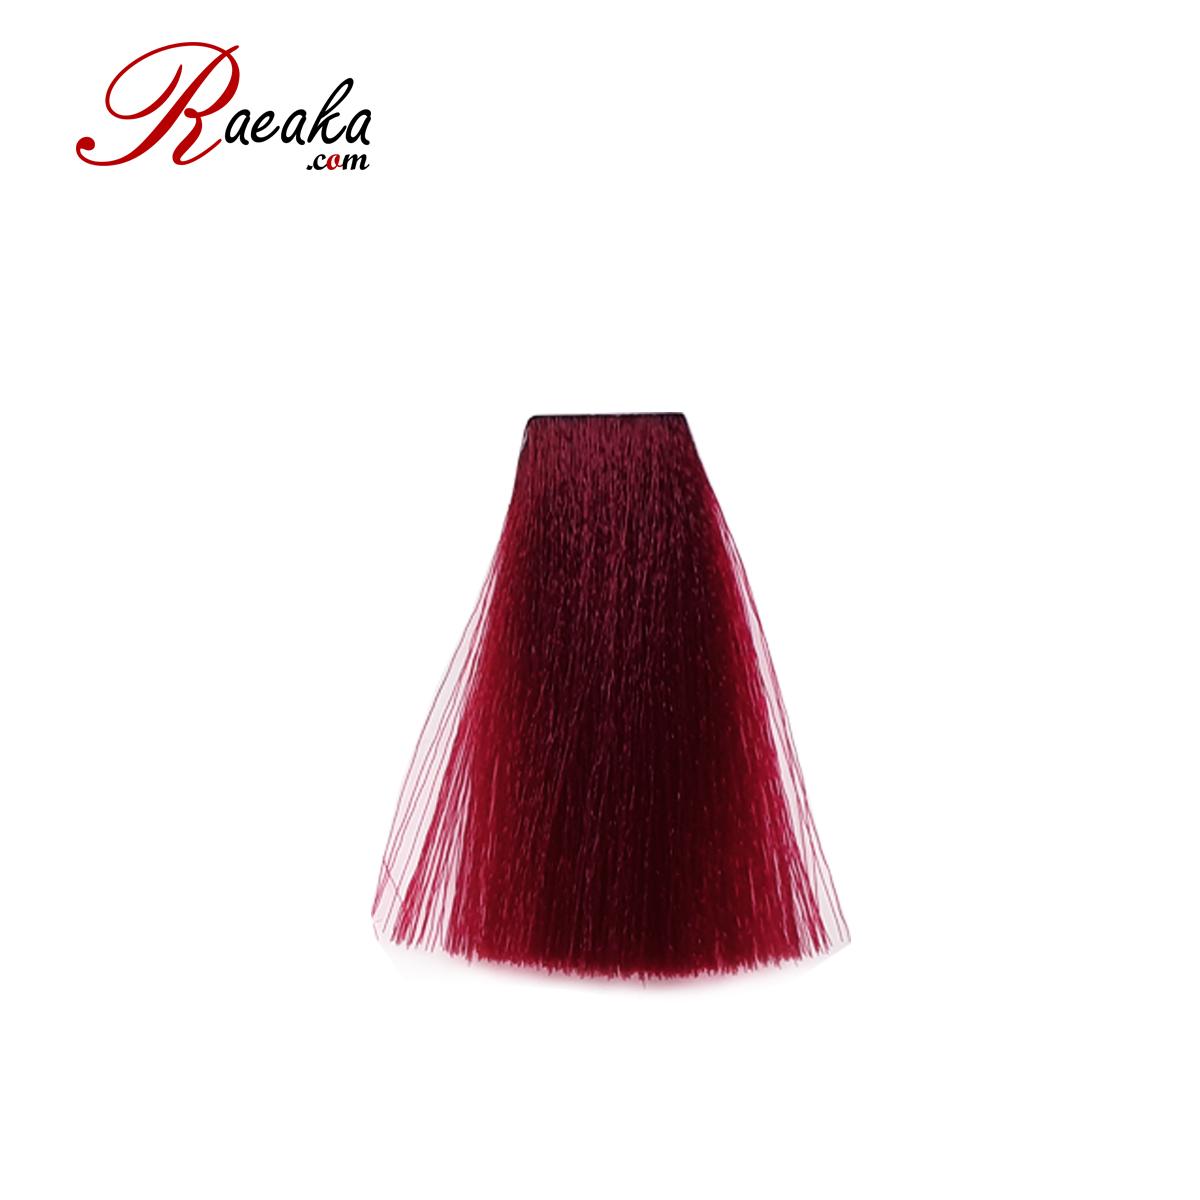 رنگ مو دوماسی سری قرمز قرمز ایرلندی ۵٫۶ حجم ۱۲۰ میلی لیتر